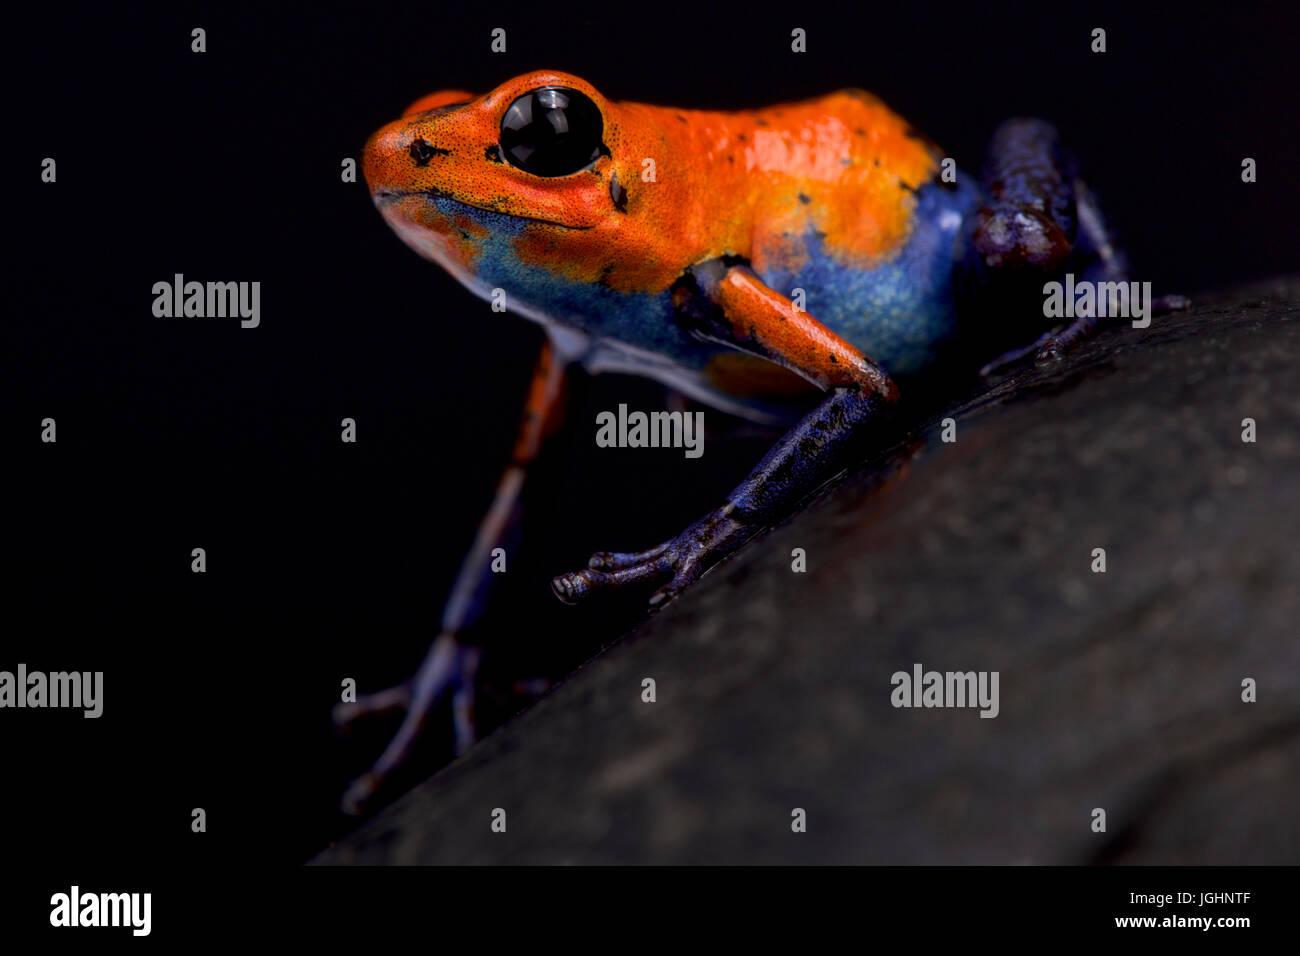 Strawberry dart frog, Oophaga pumilio 'Blue jeans Nicaragua' - Stock Image